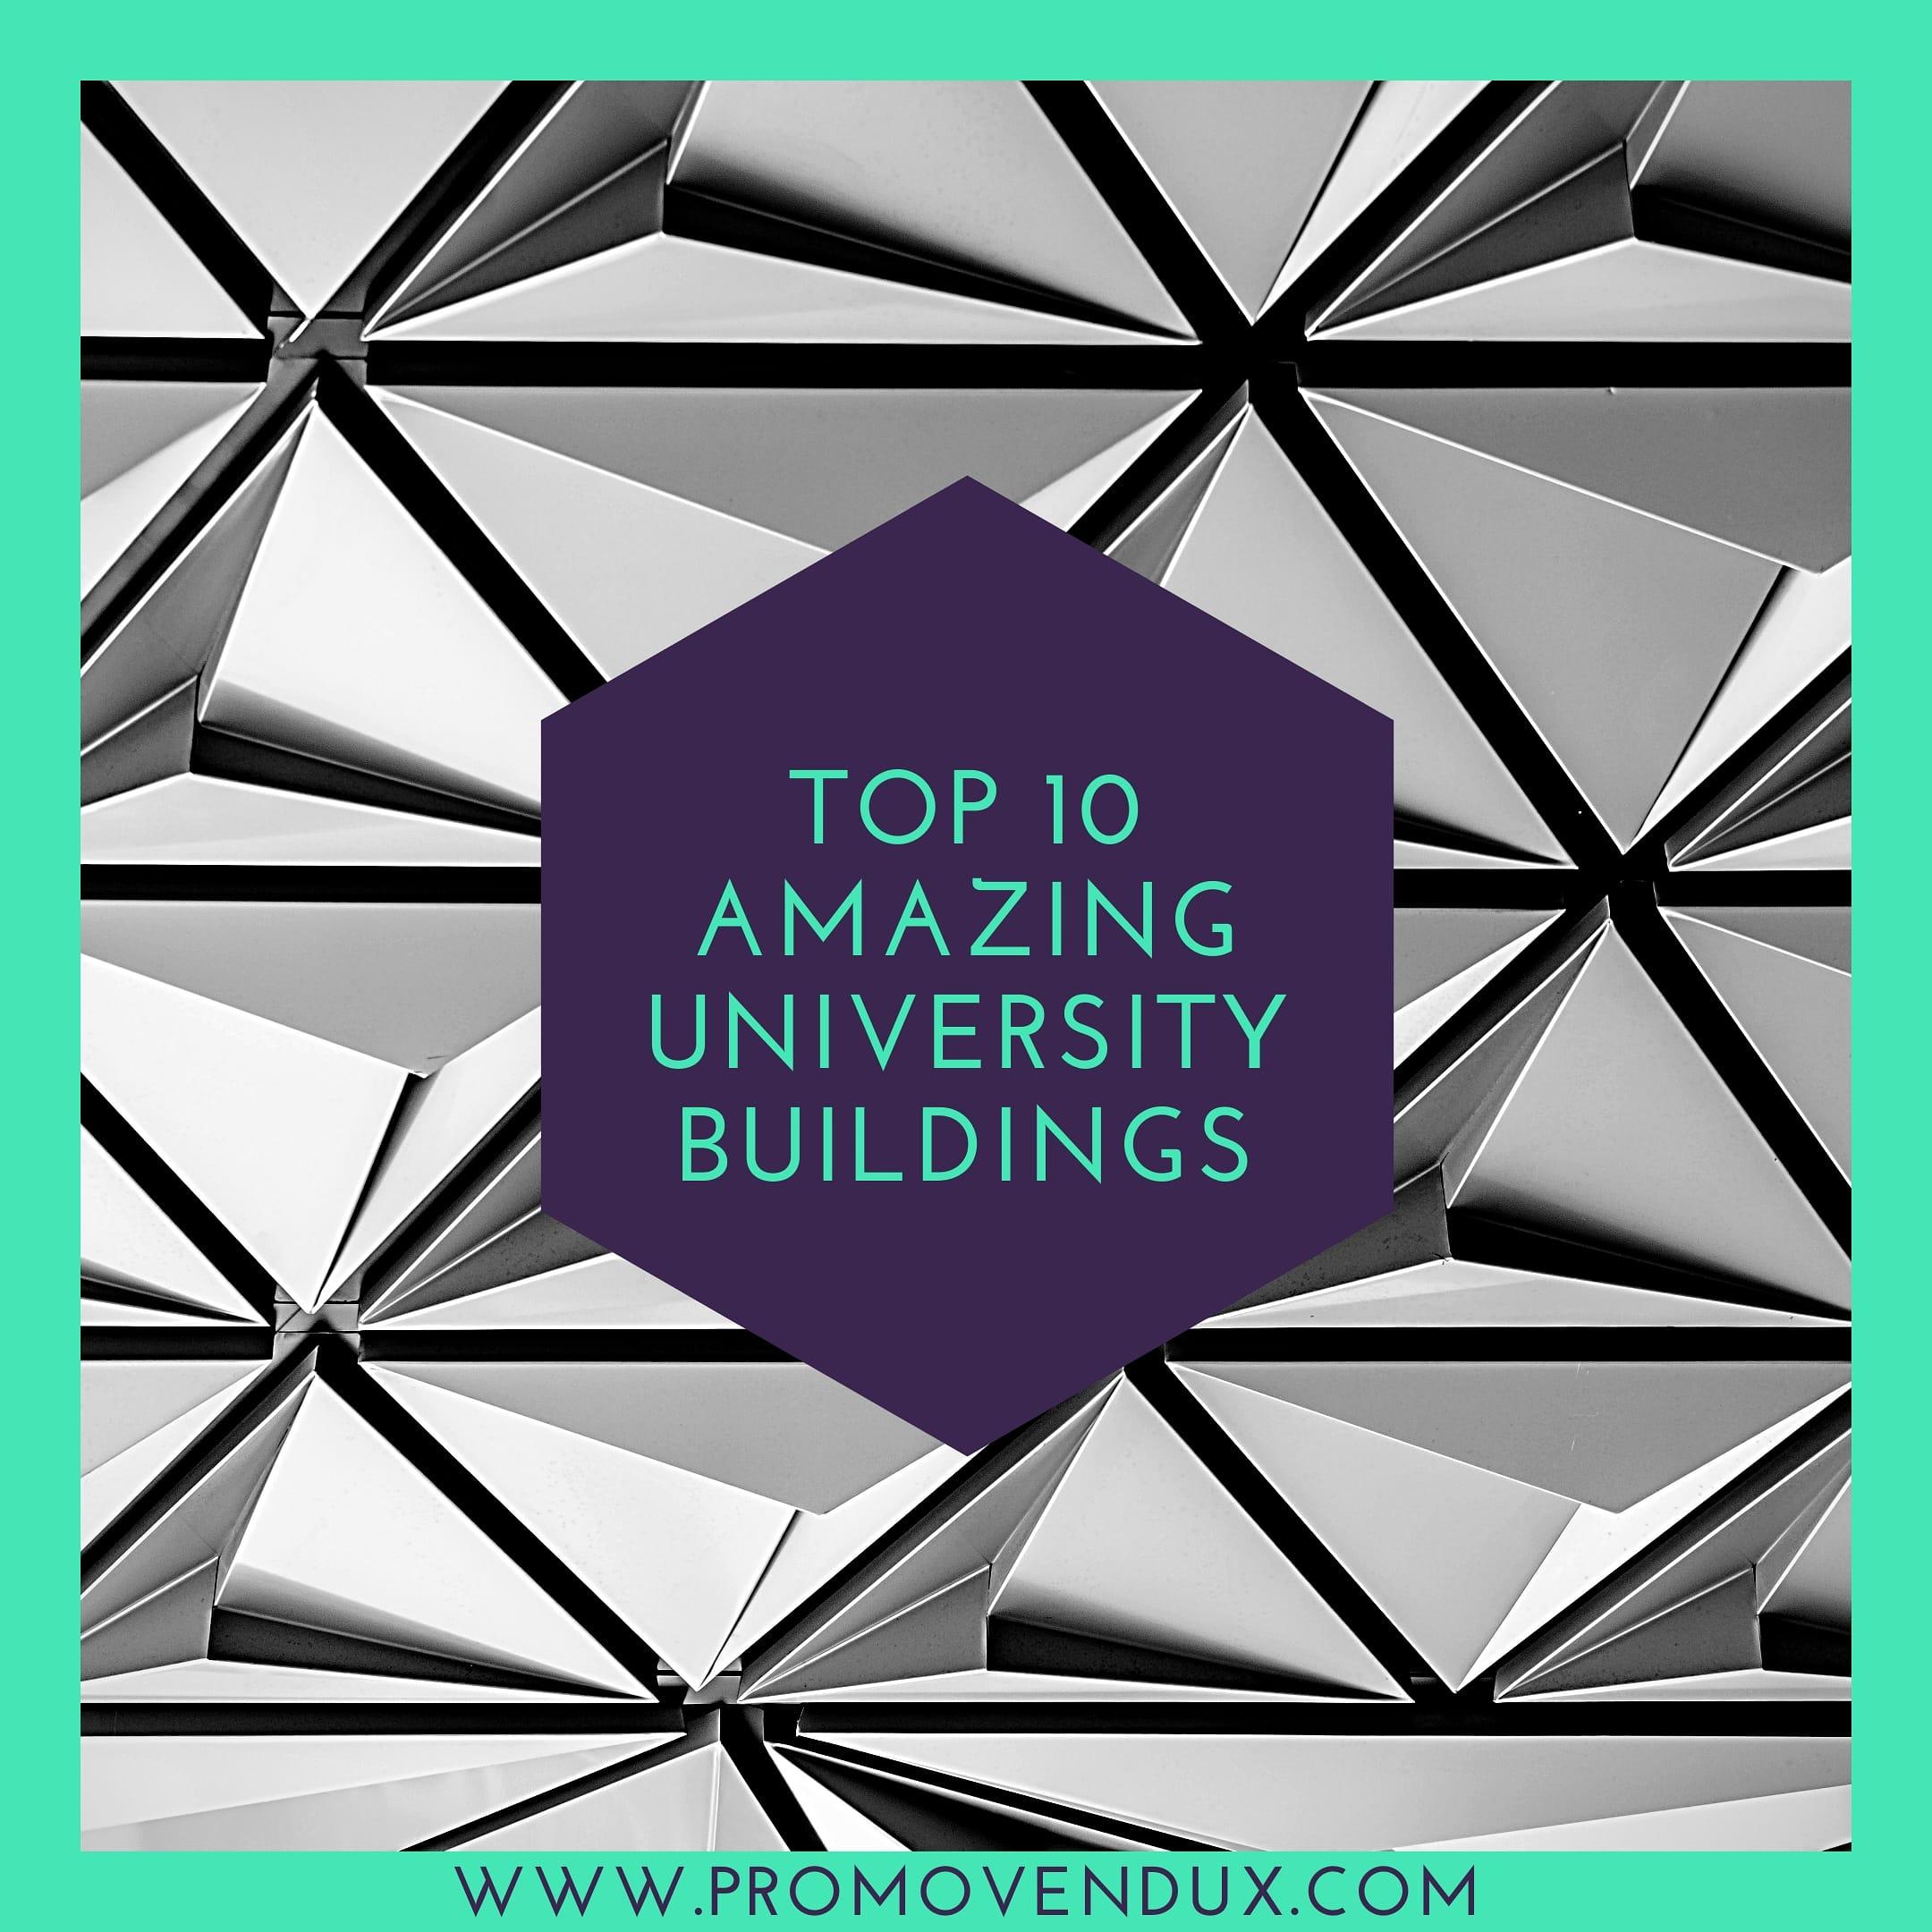 Top 10 Most Amazing University Buildings